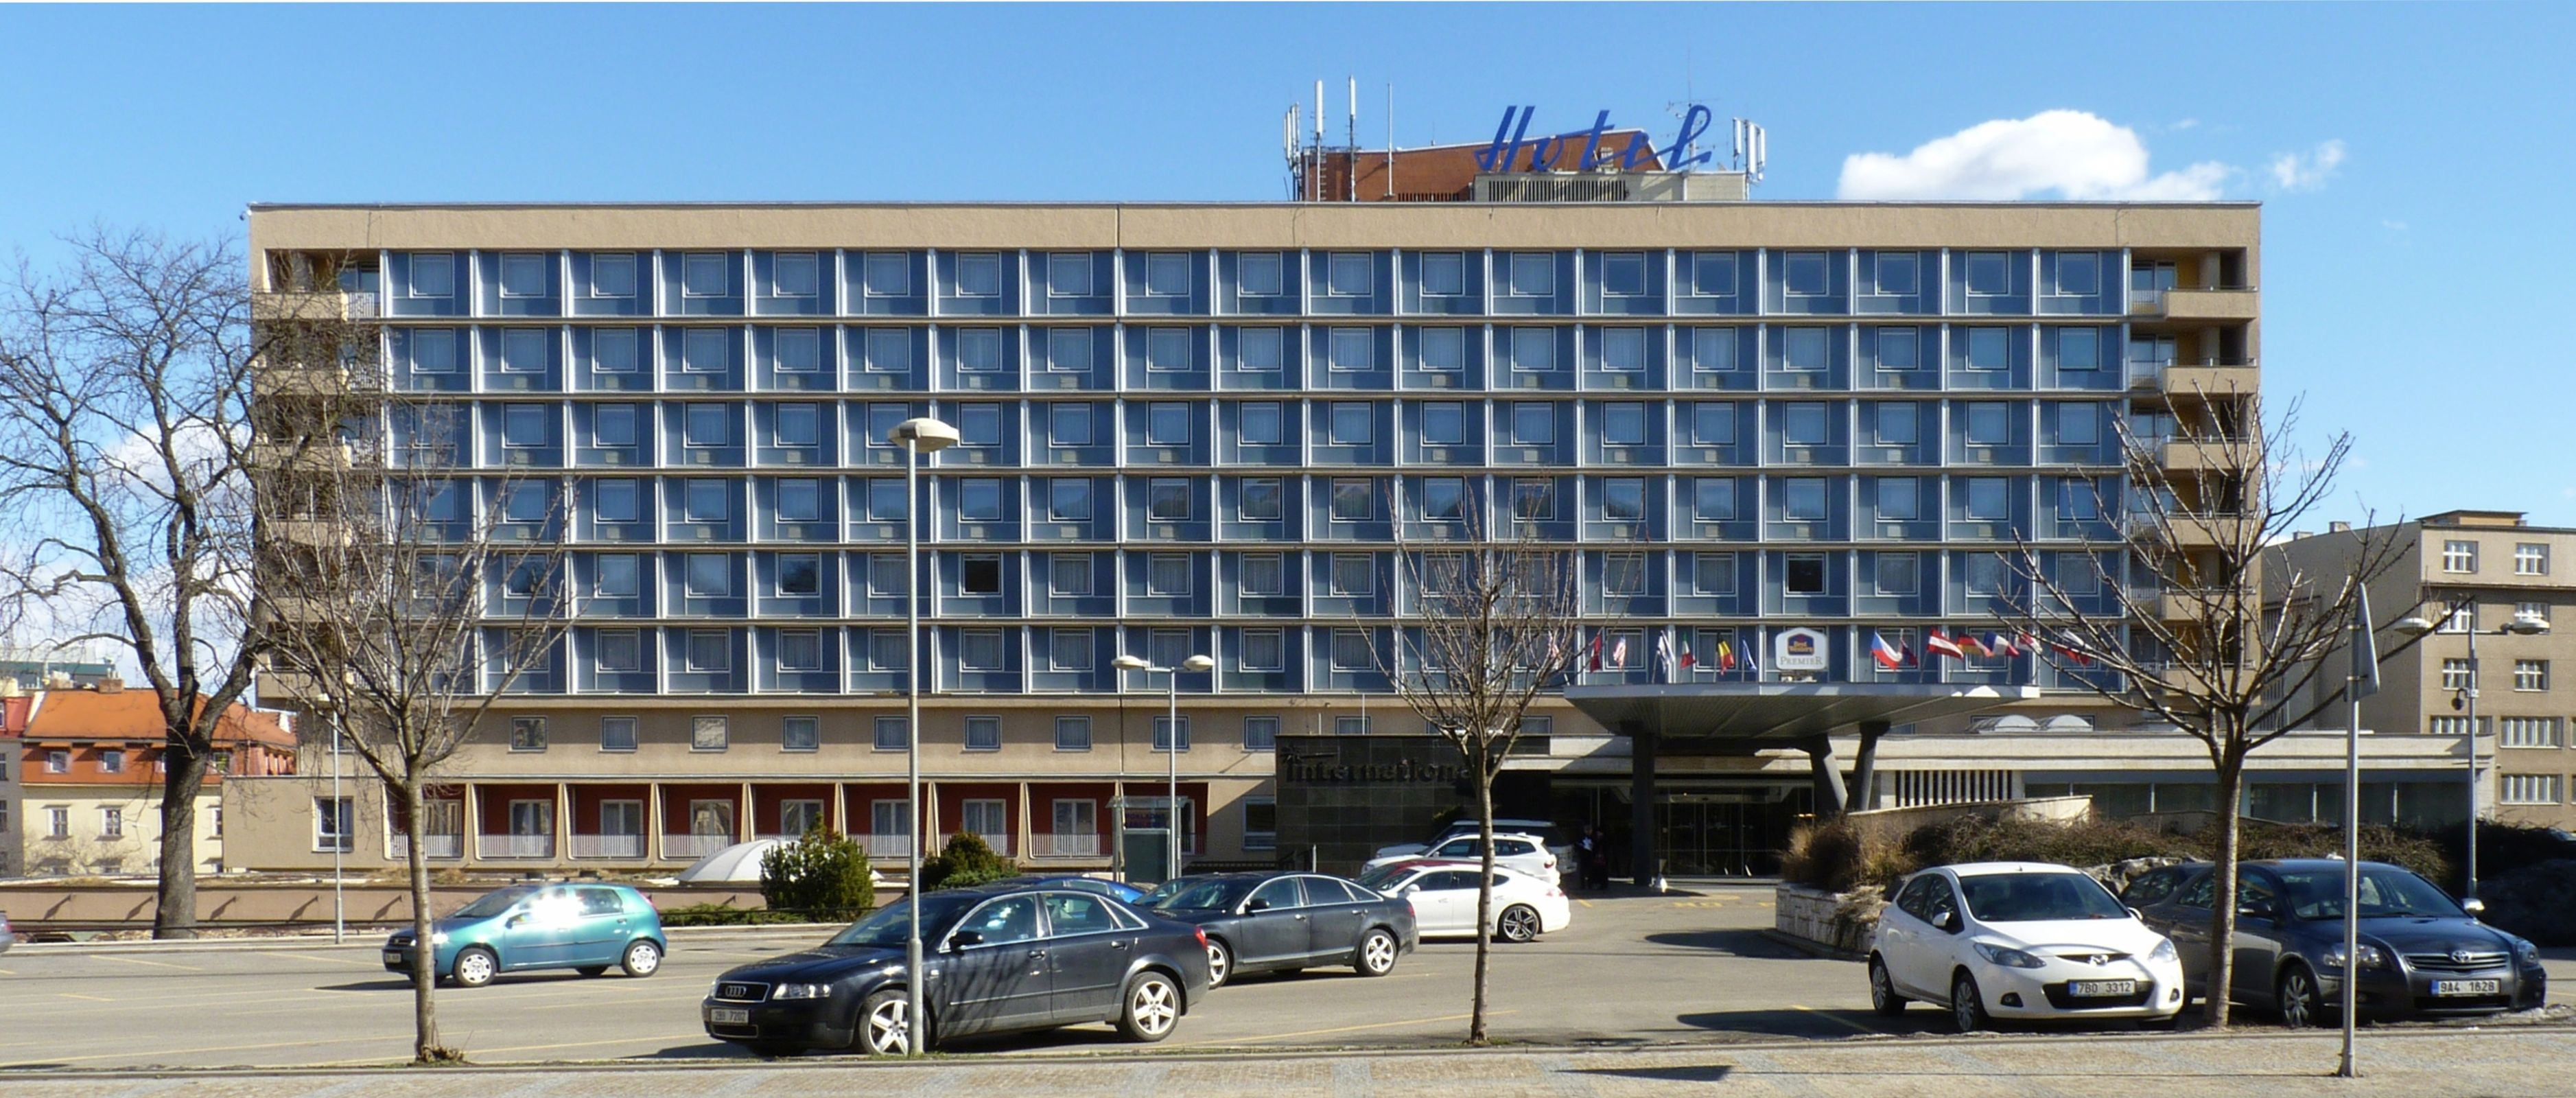 Hotel International in Brno